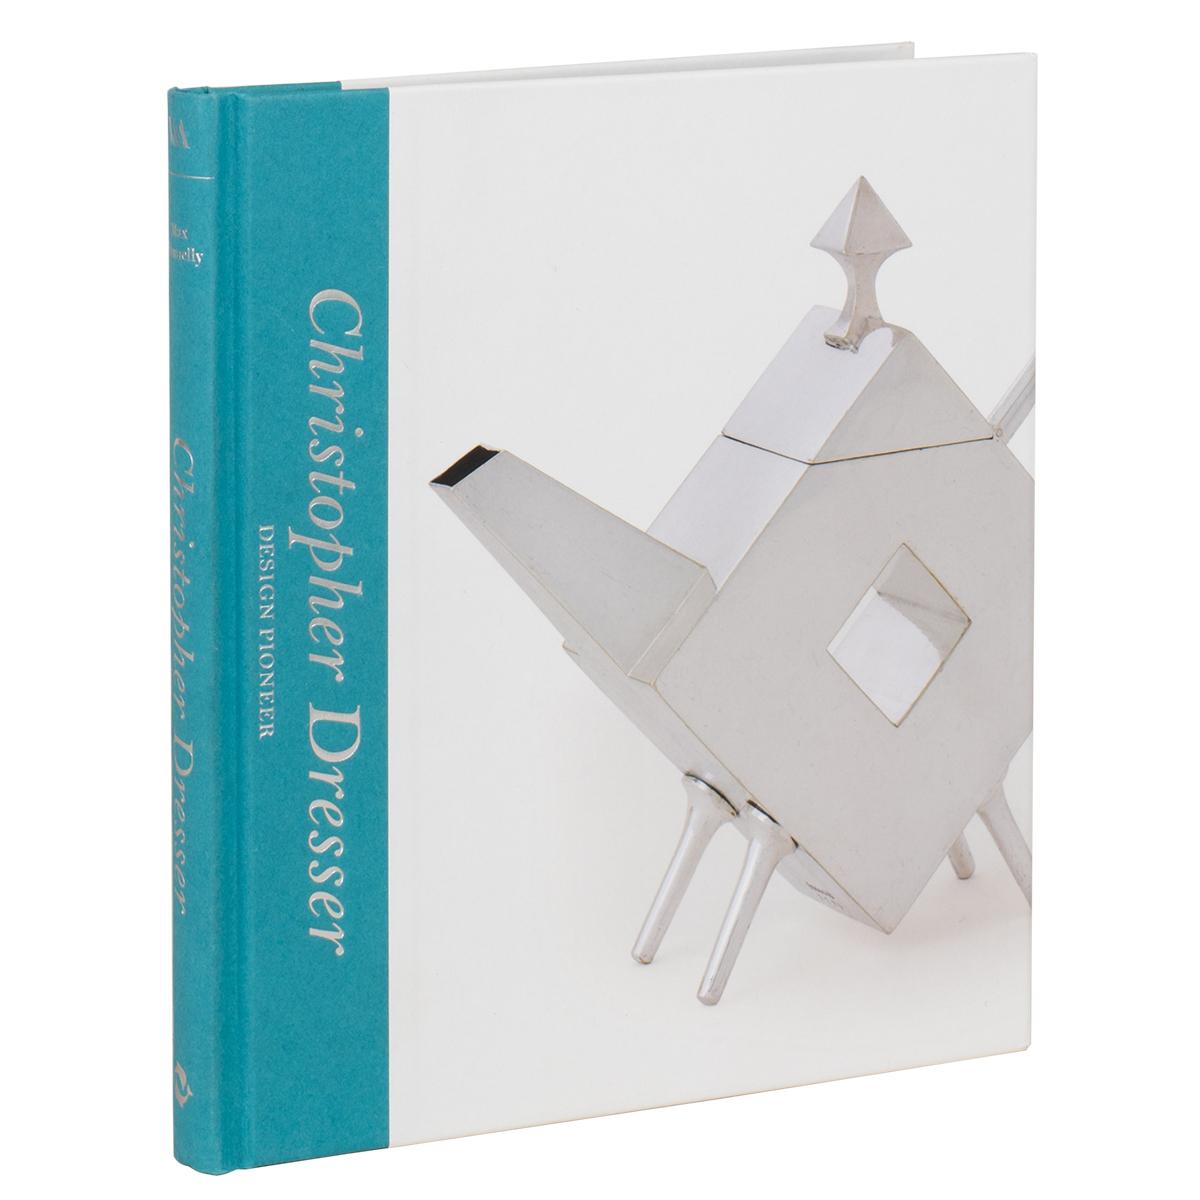 Christopher Dresser: Design Pioneer